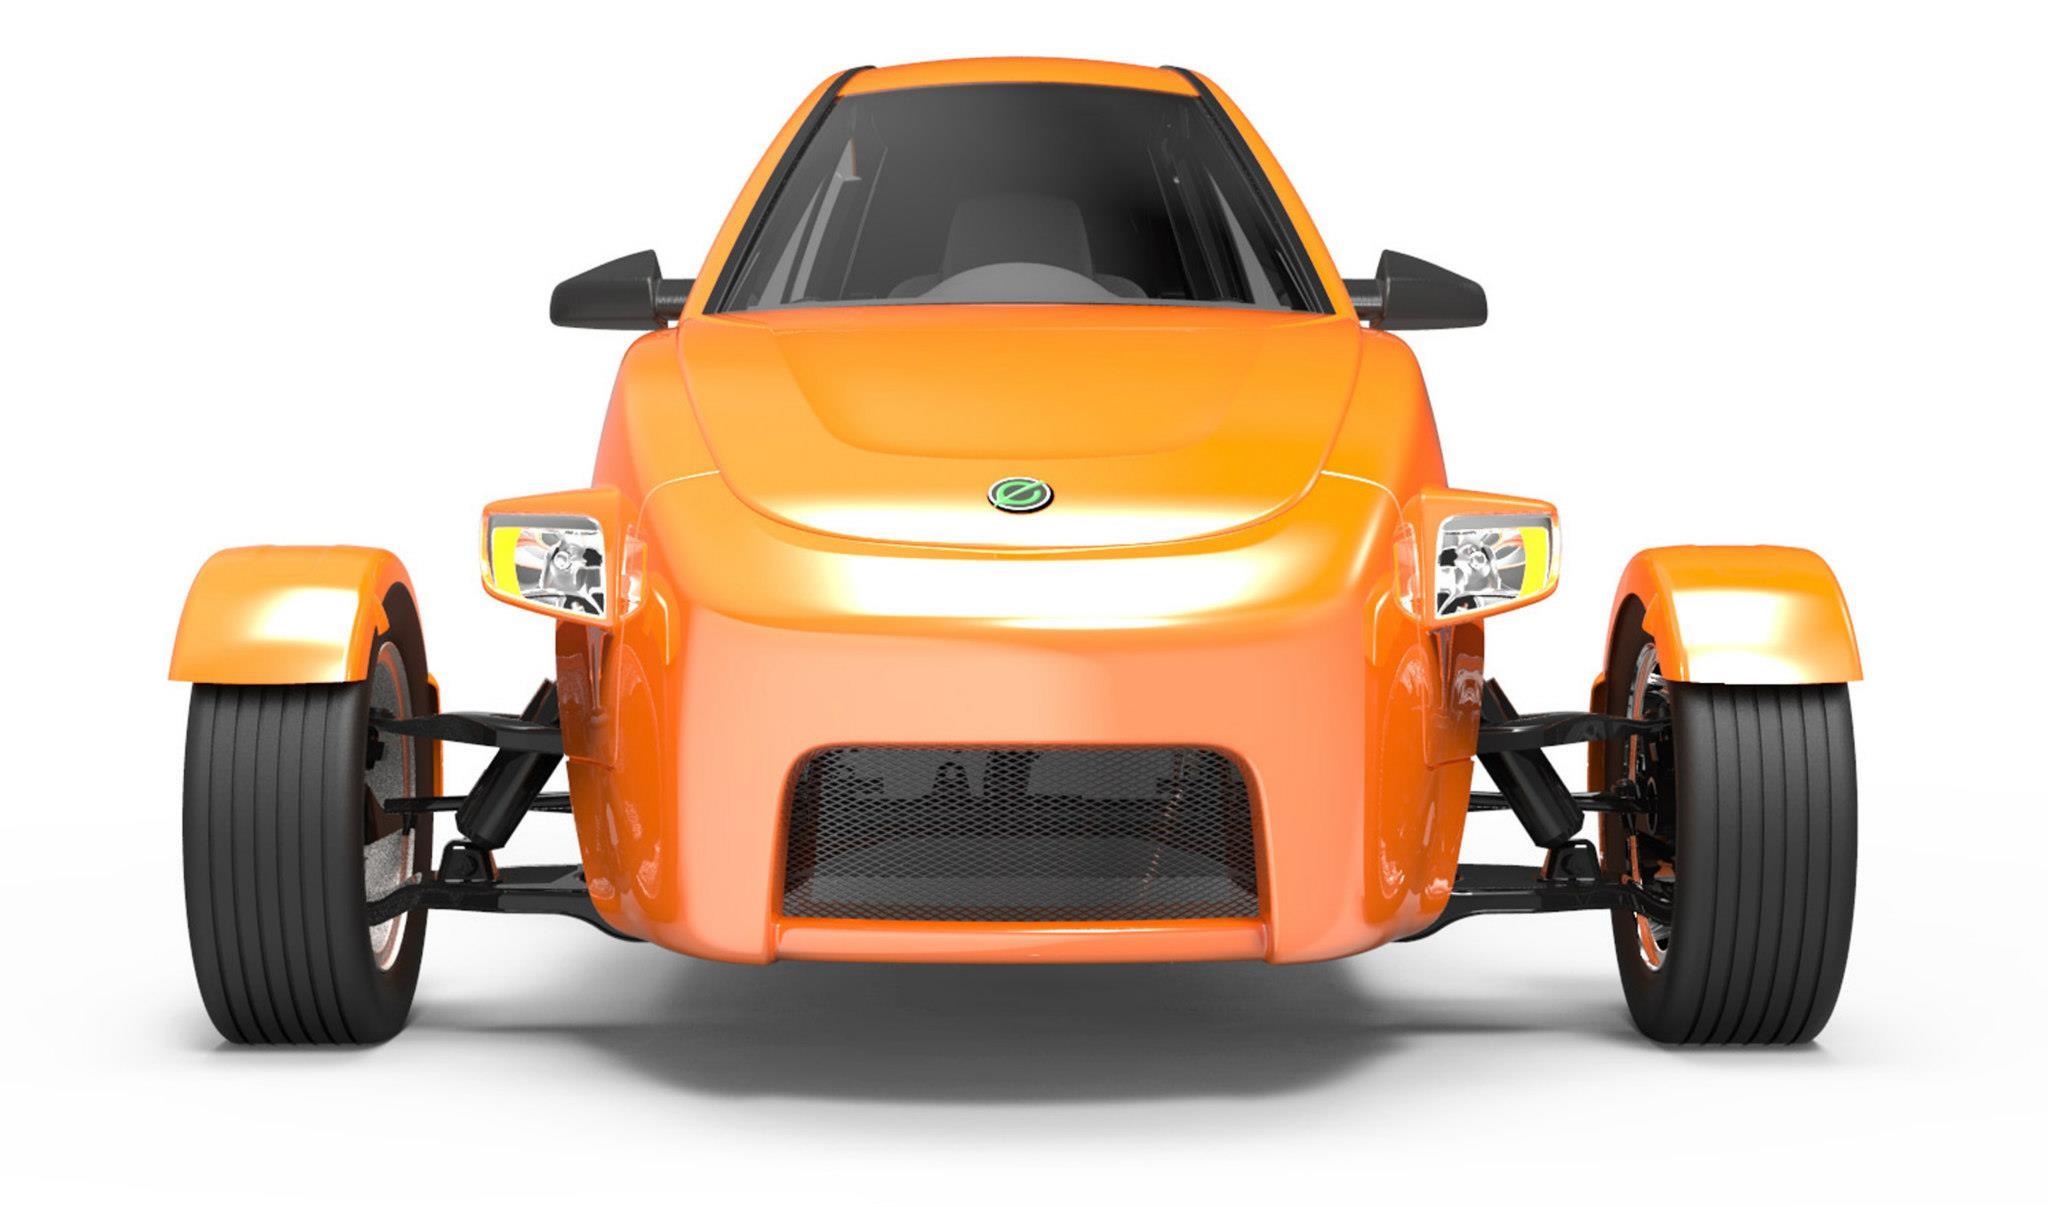 Elio Motors 7 000 84mpg Car Inches Closer Toward